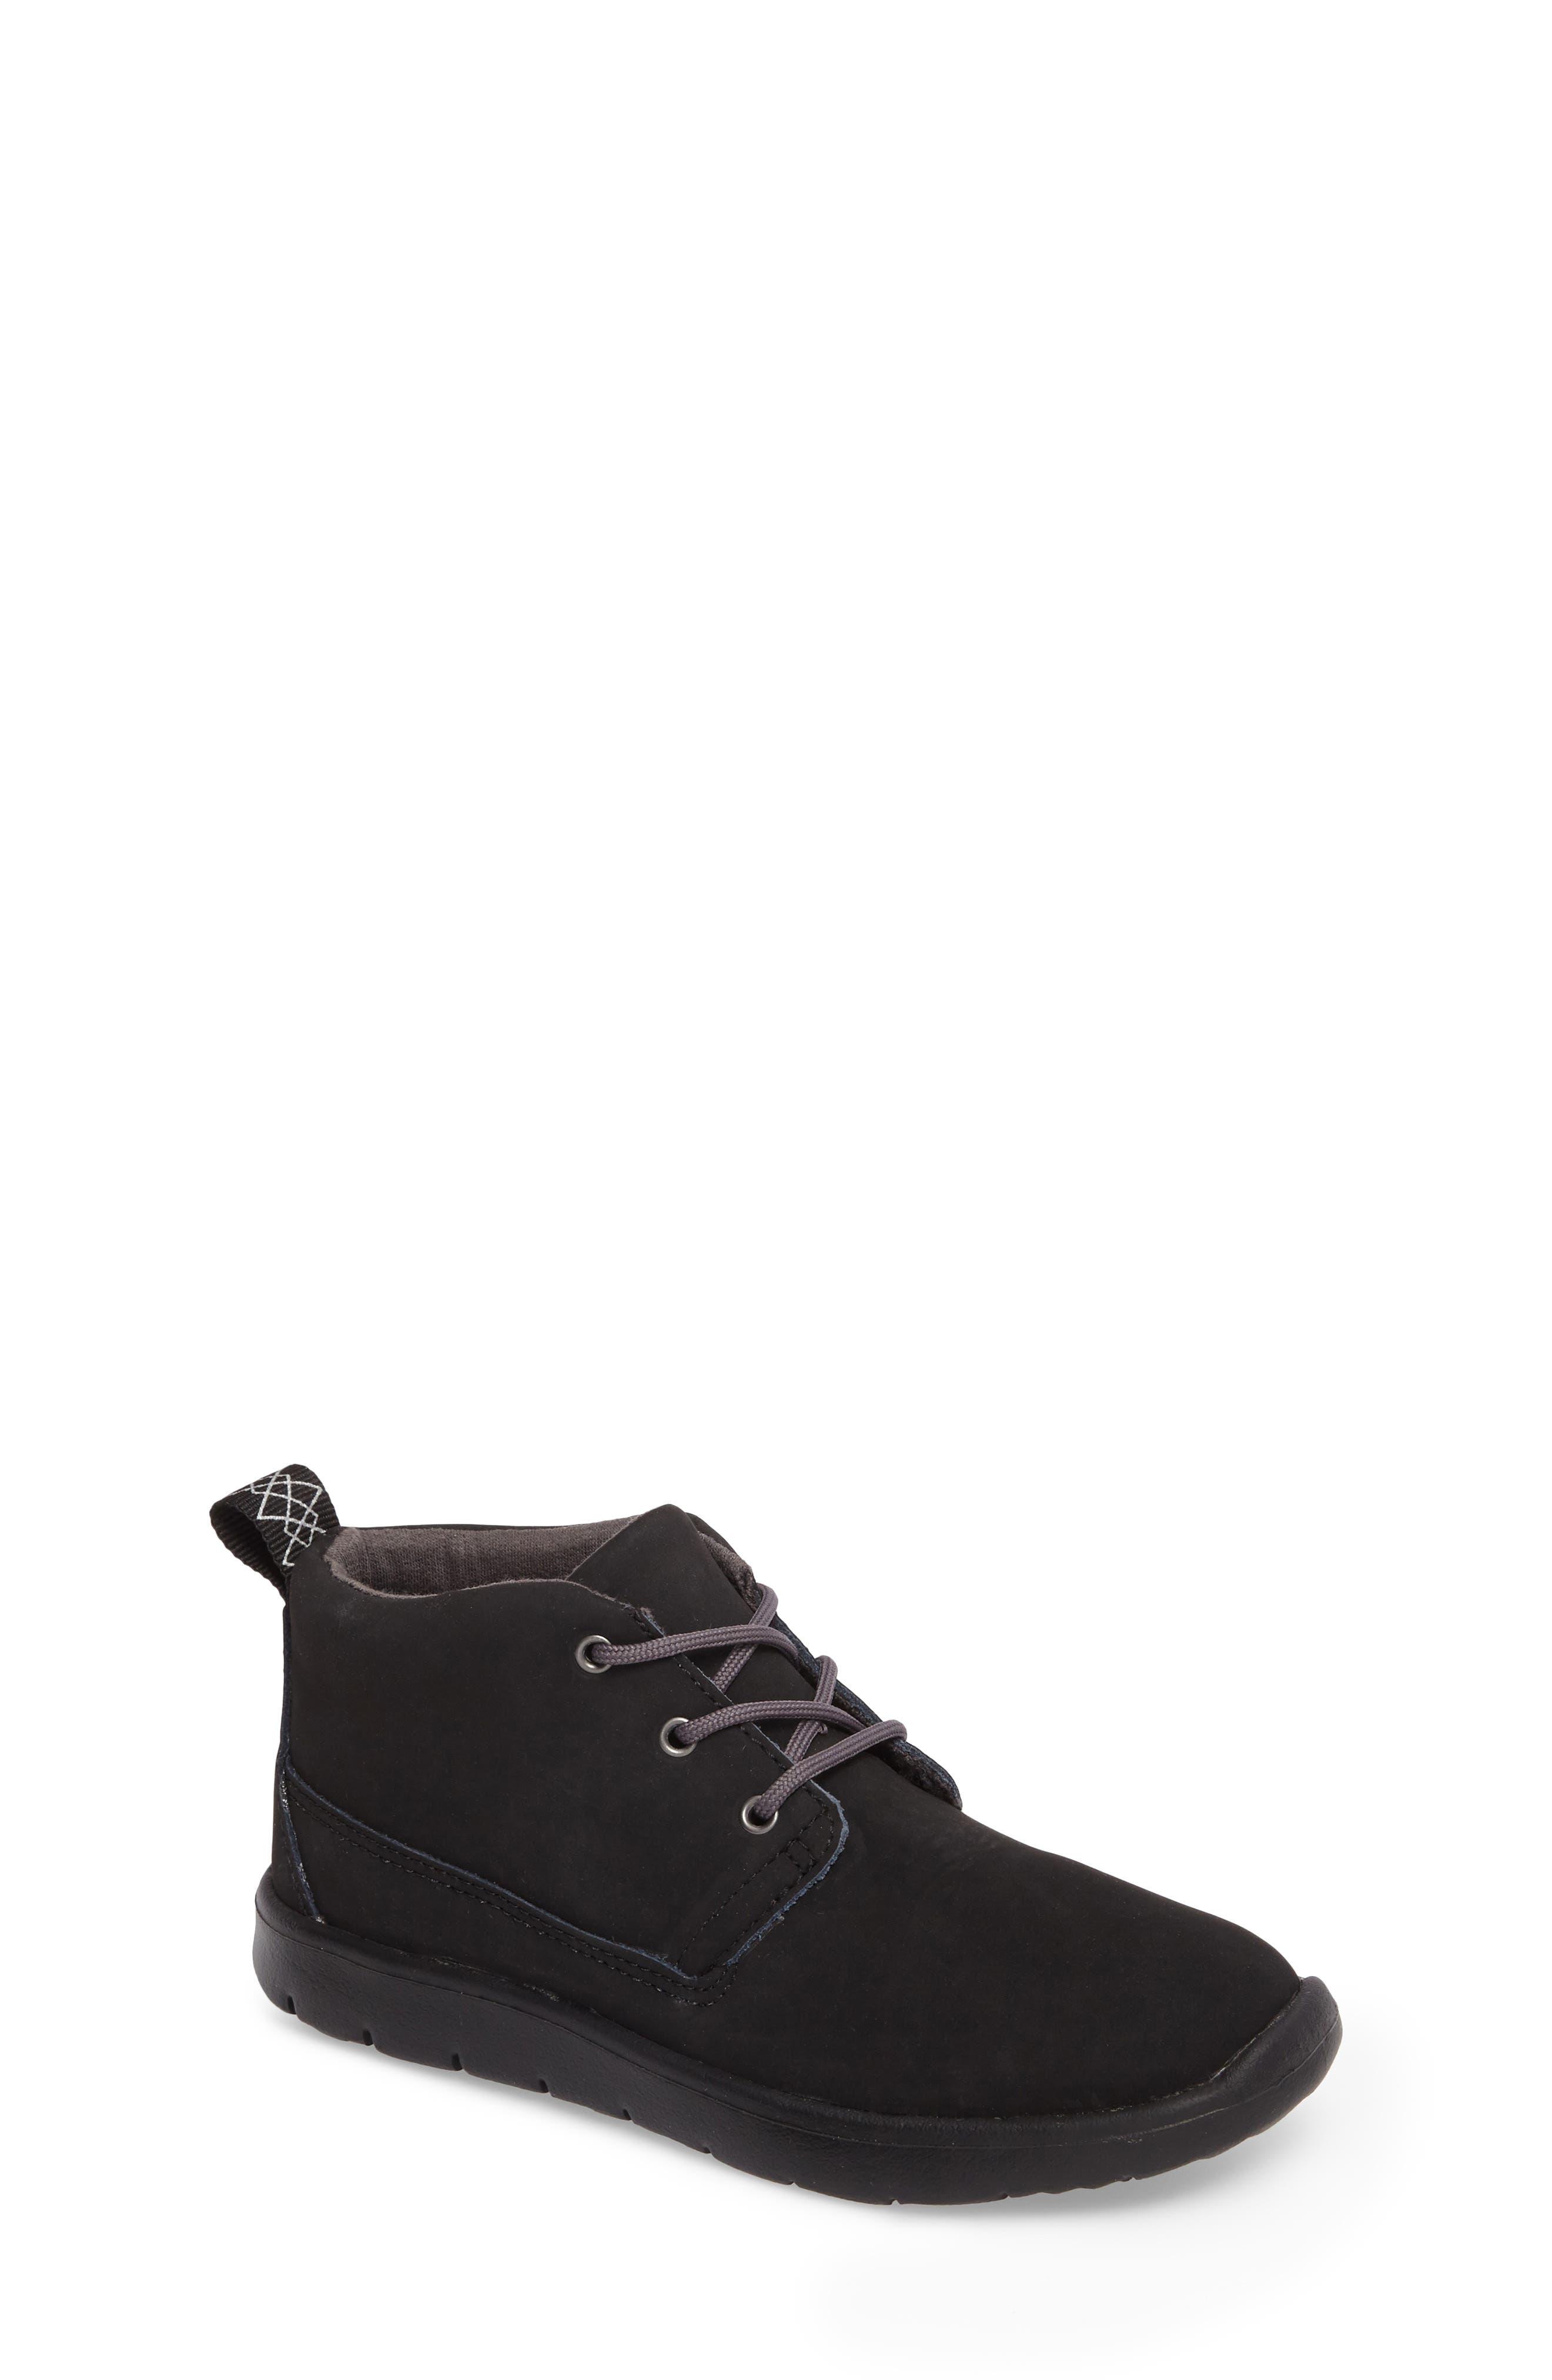 Canoe Water Resistant Chukka Sneaker,                         Main,                         color, Black